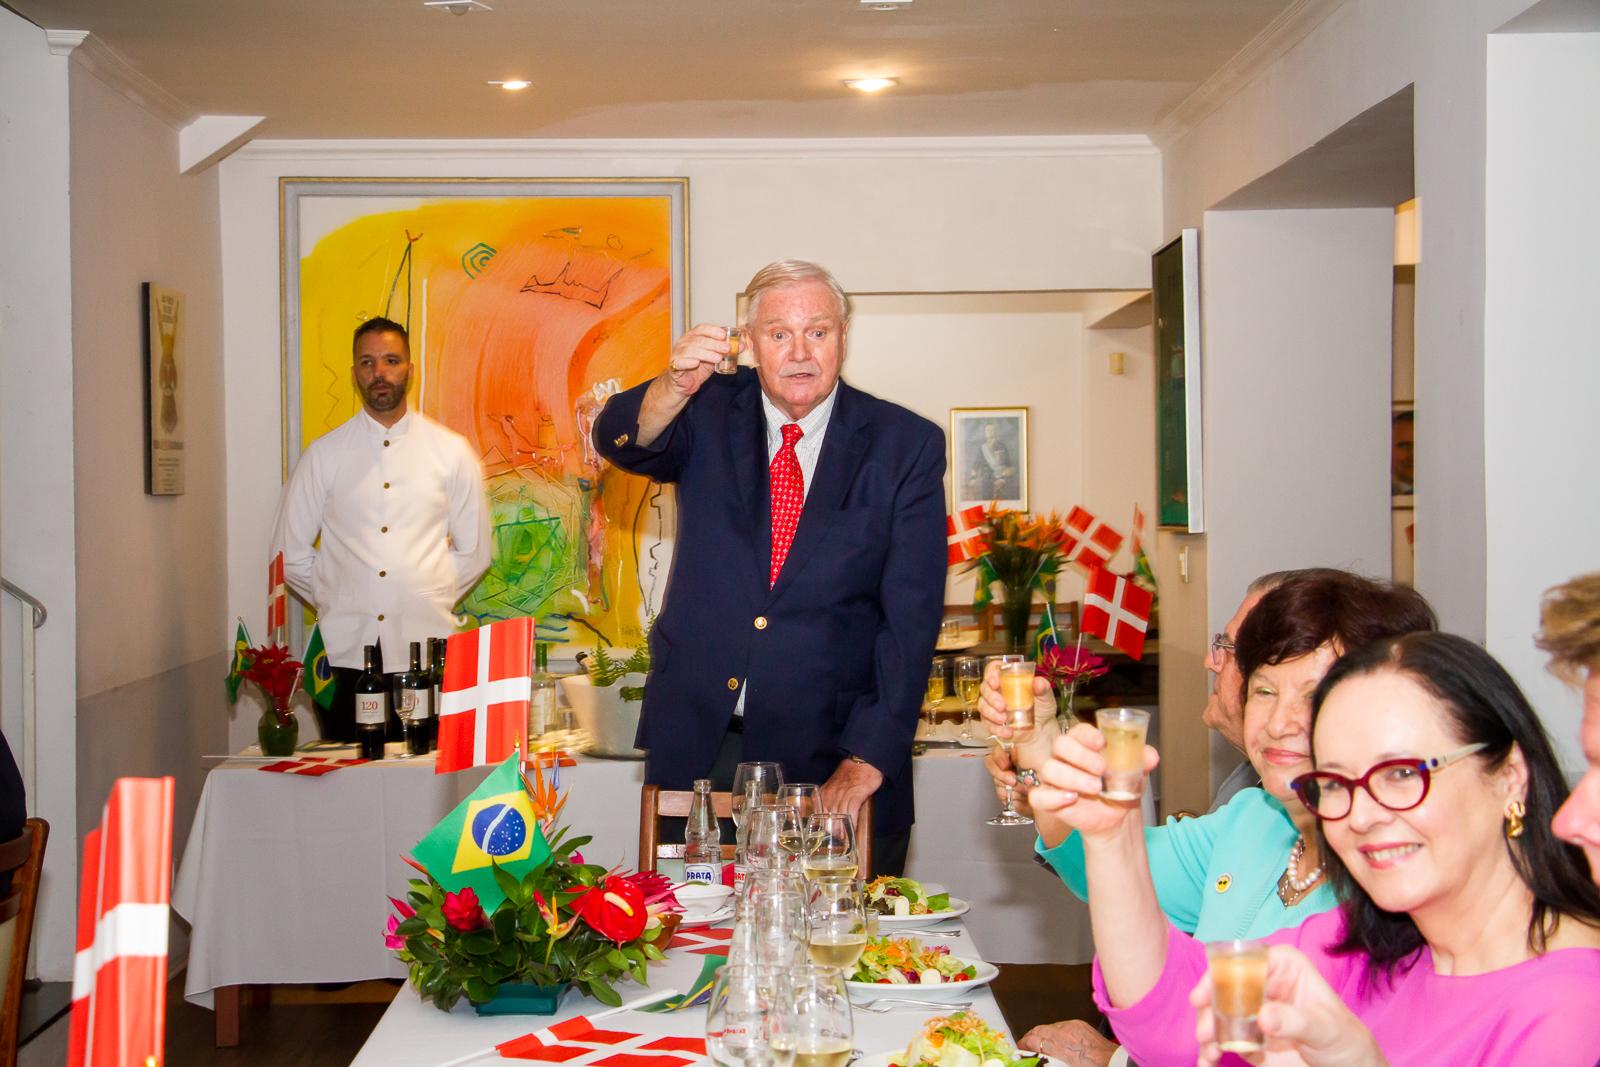 visita da Princesa Benedikte da Dinamarca no Brasil